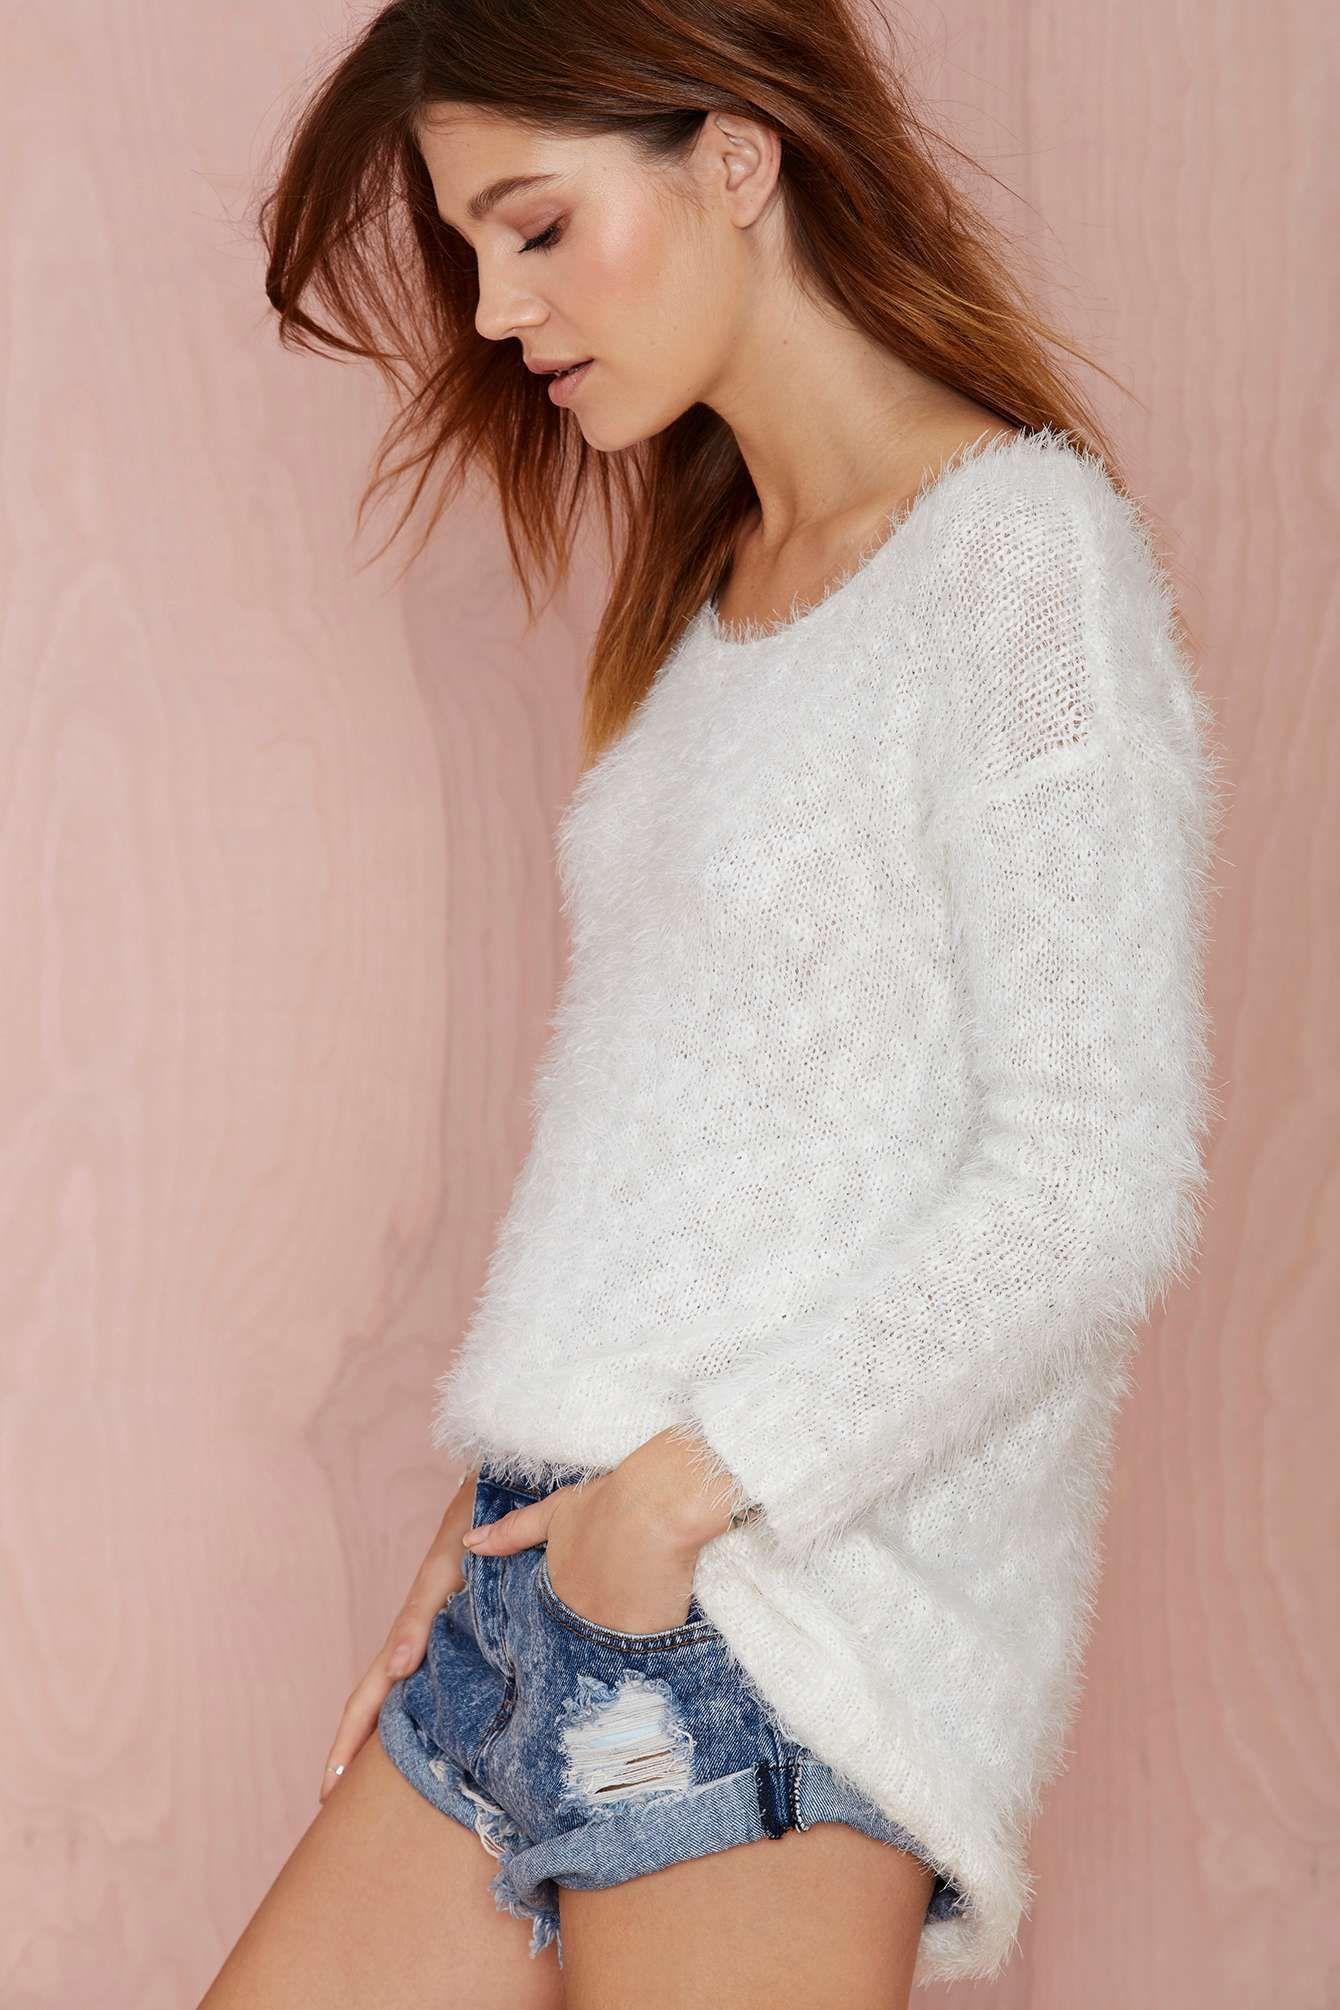 Winter white scoop neck sweater